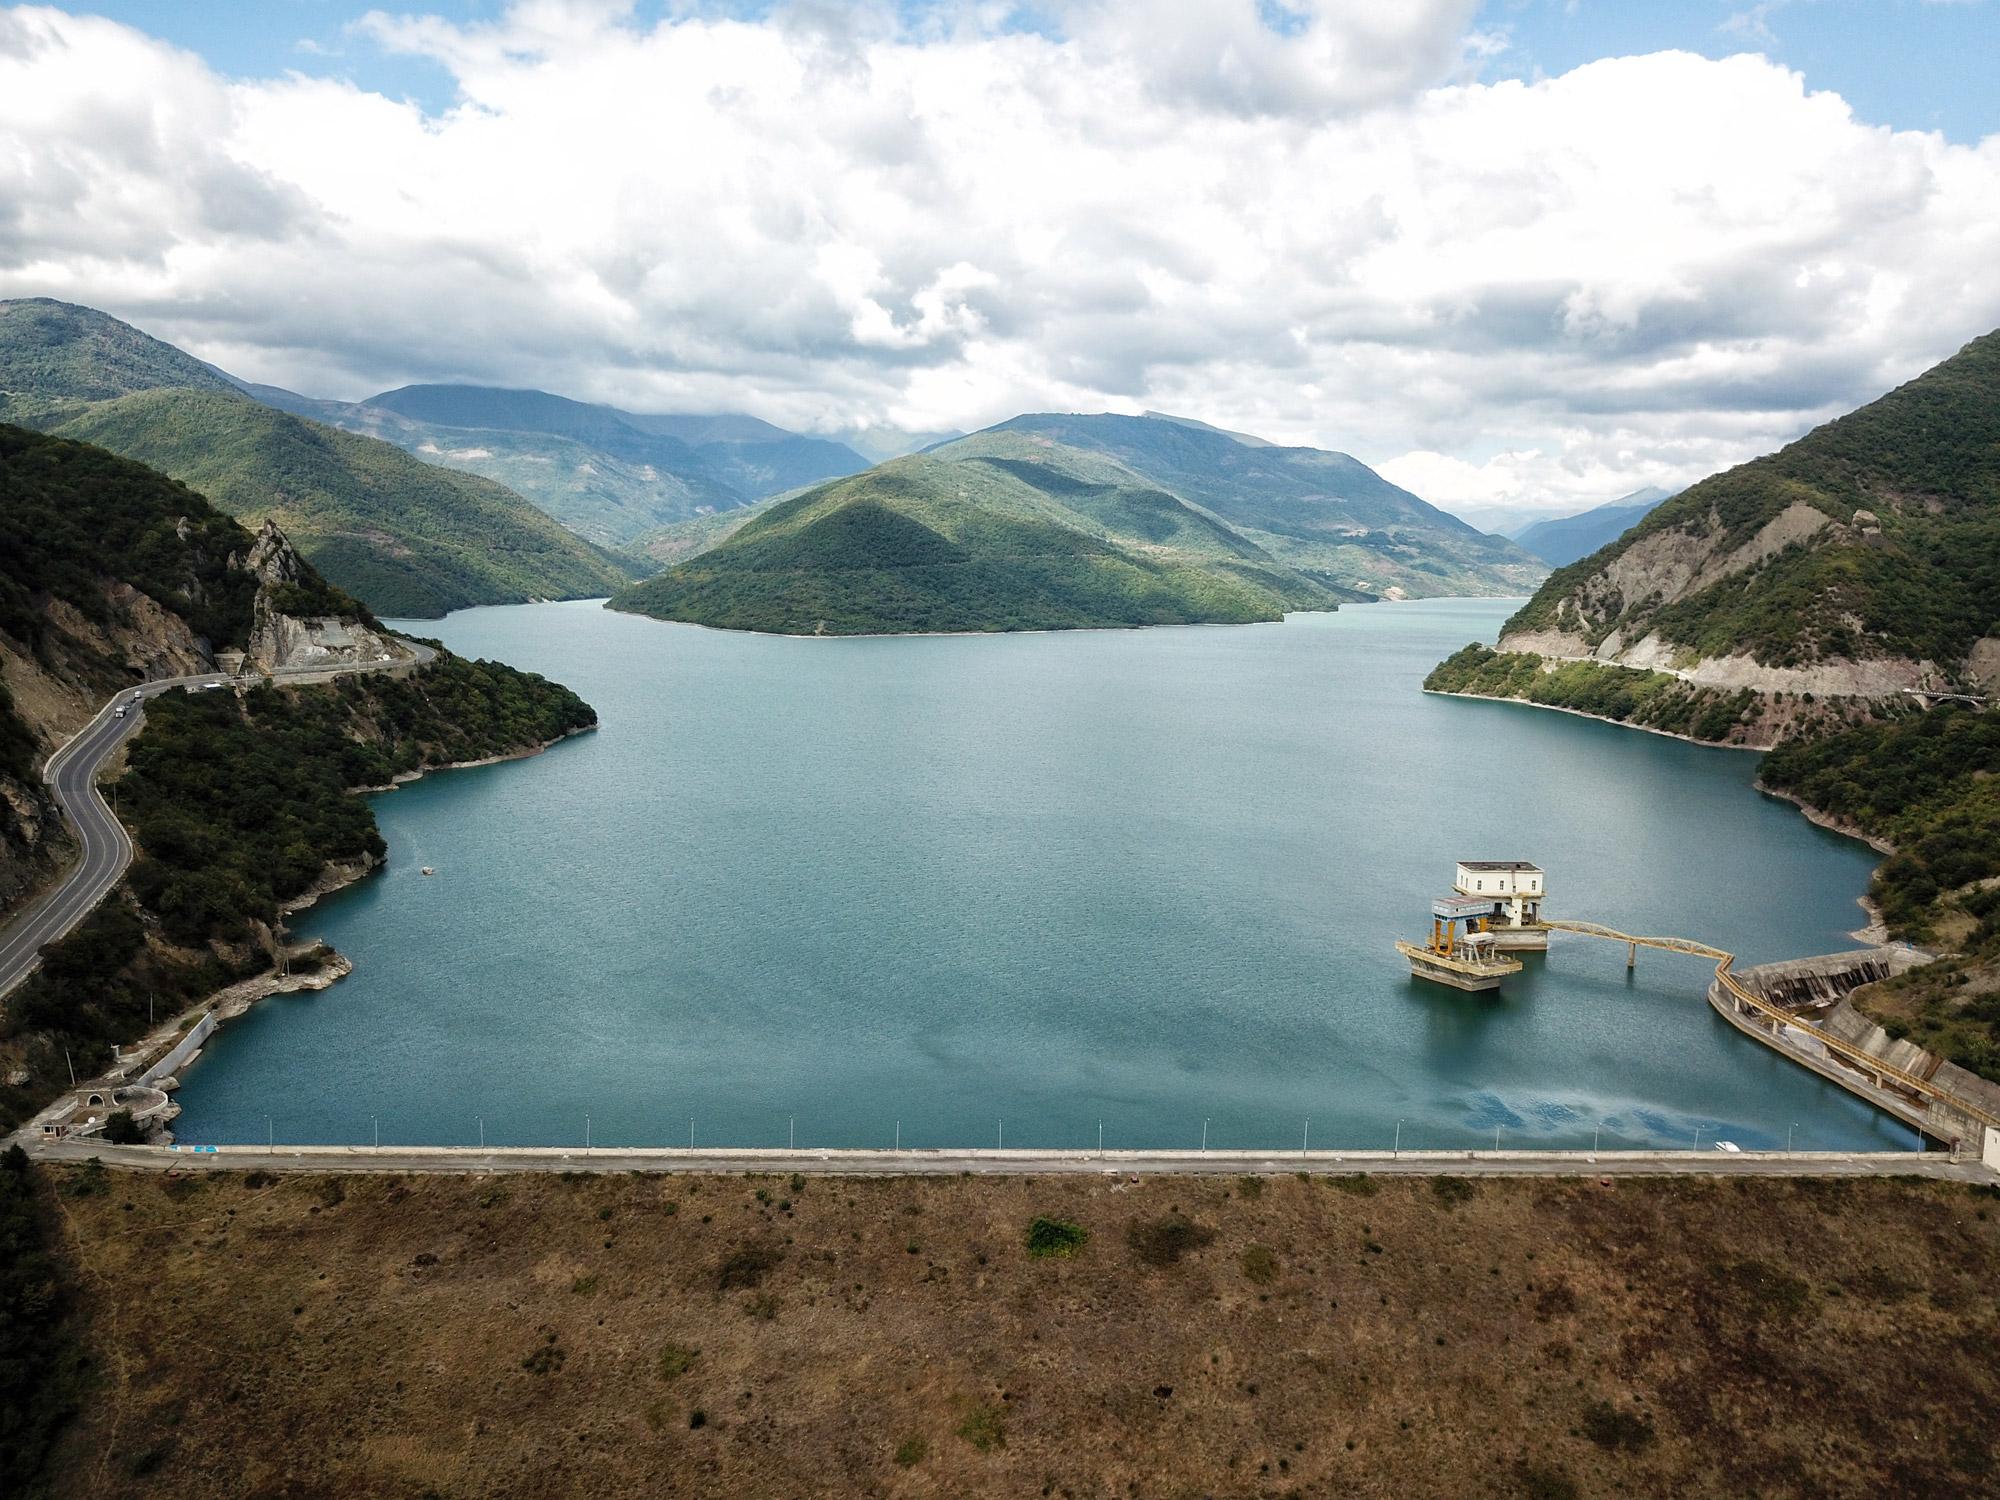 Georgië reisverslag - Zhinvali Dam